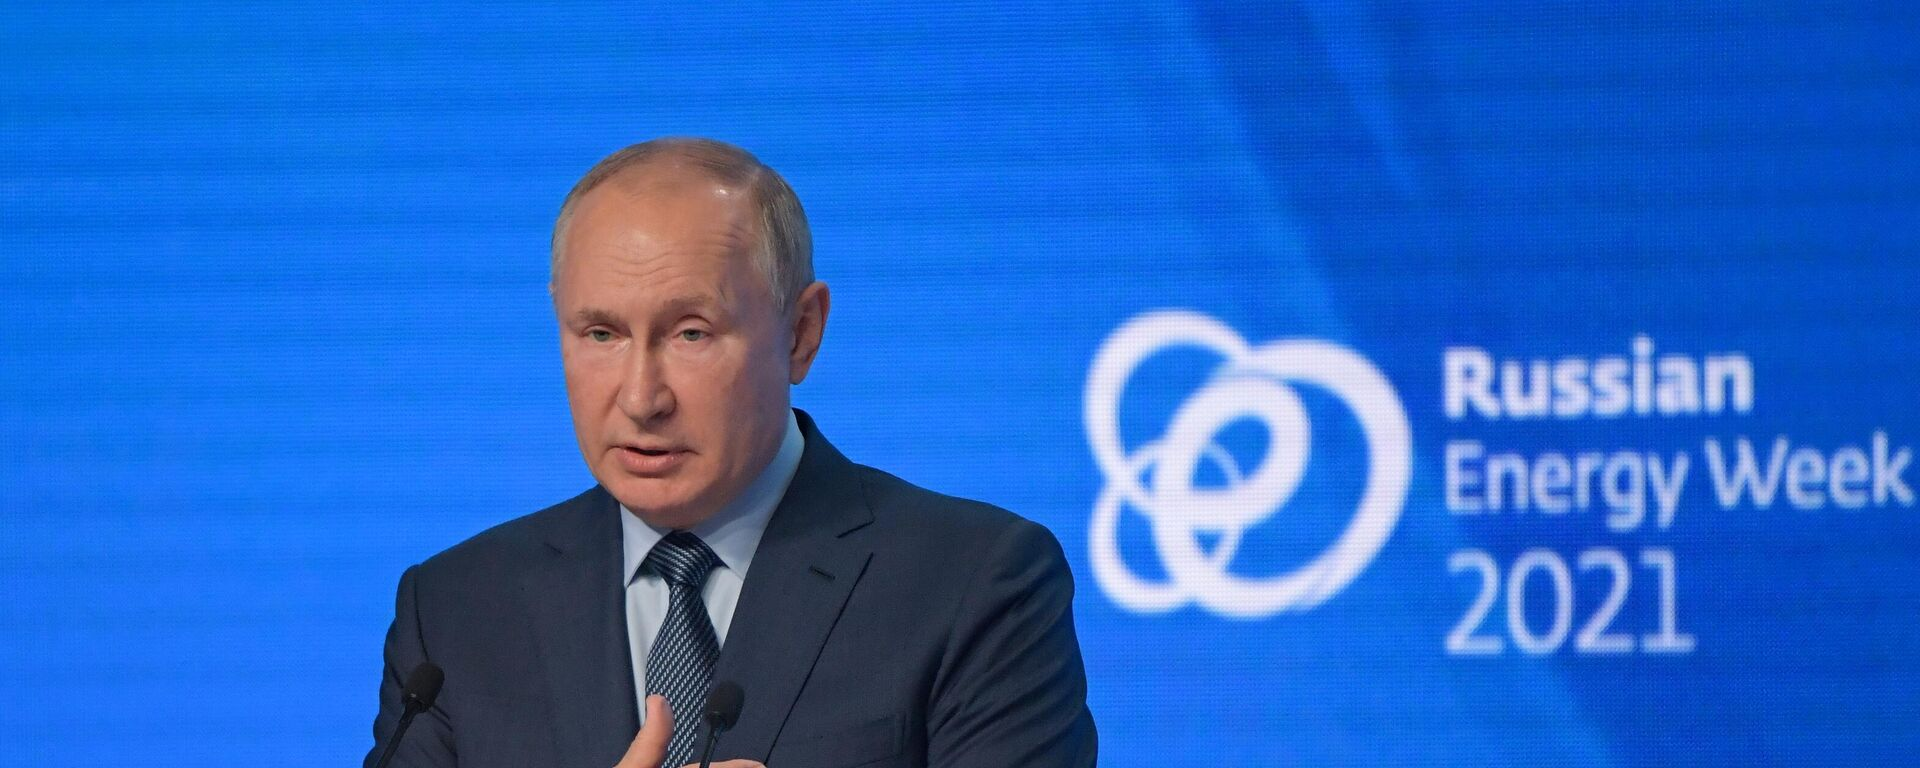 Predsednik Rusije Vladimir Putin - Sputnik Srbija, 1920, 13.10.2021